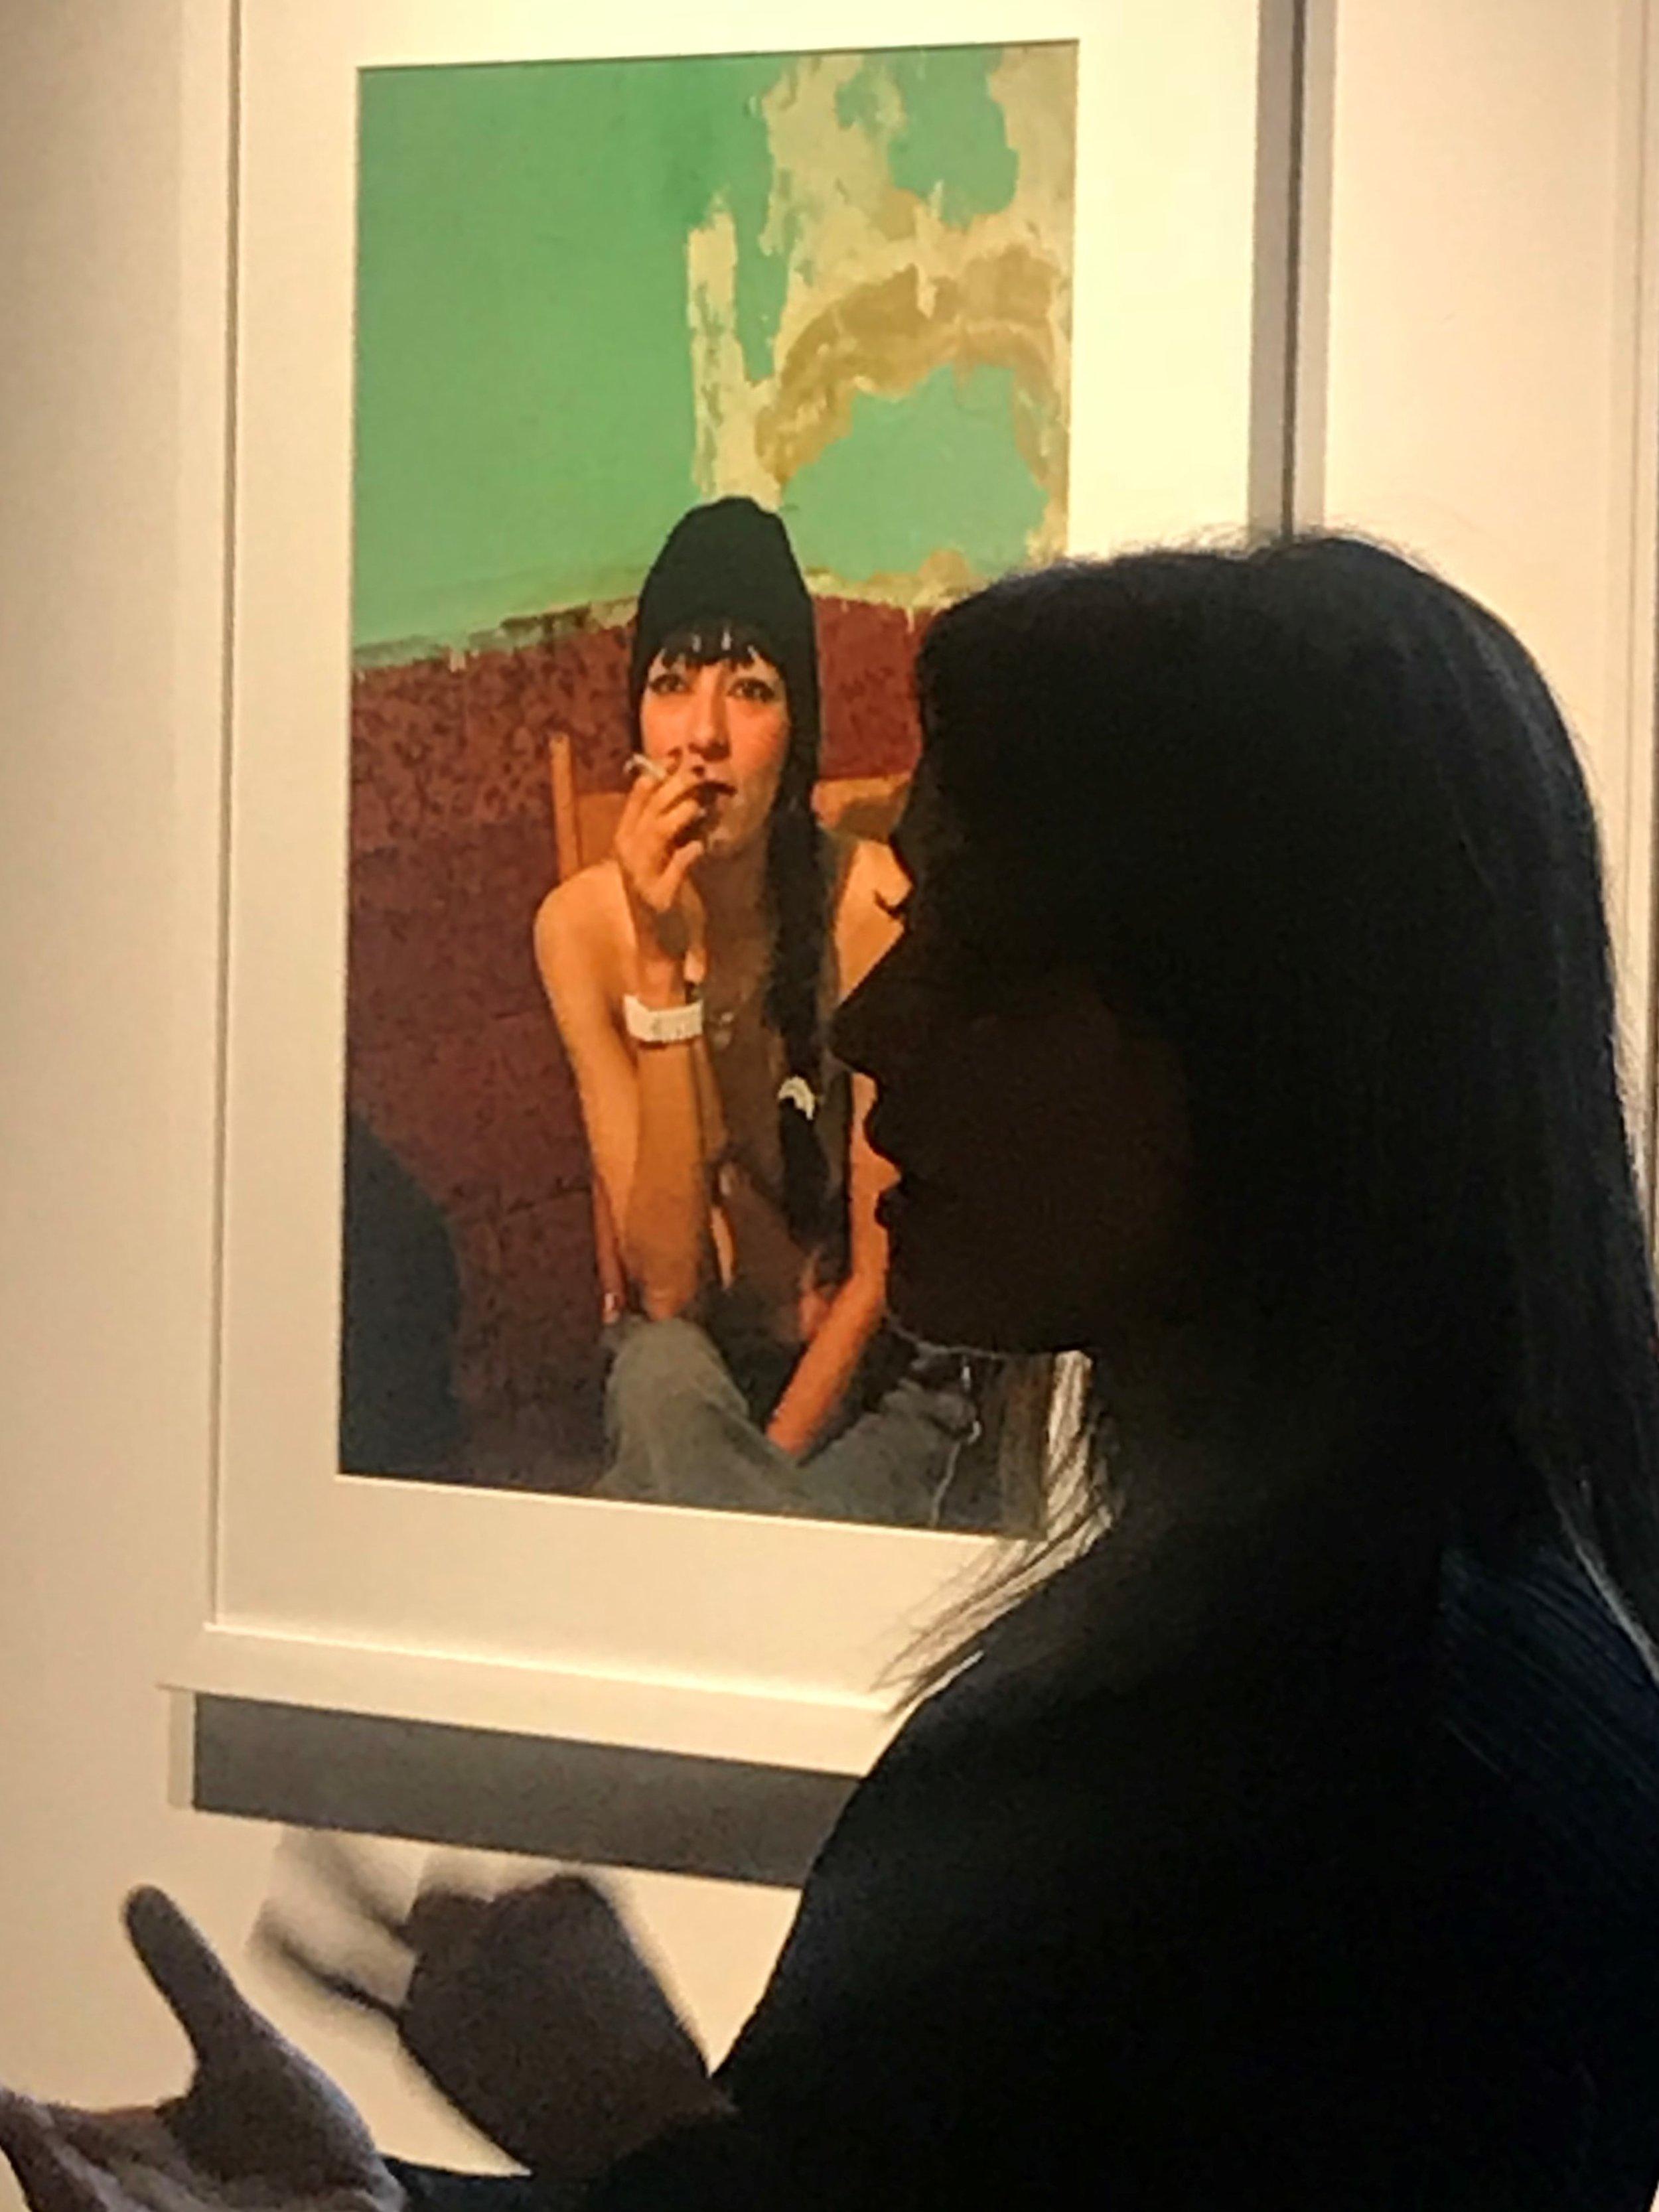 Ada Trillo talks to students of Department of Anthropology, John Jay College_The Un-Heroic Act_Sept. 26 2018. Photo Monika Fabijanska